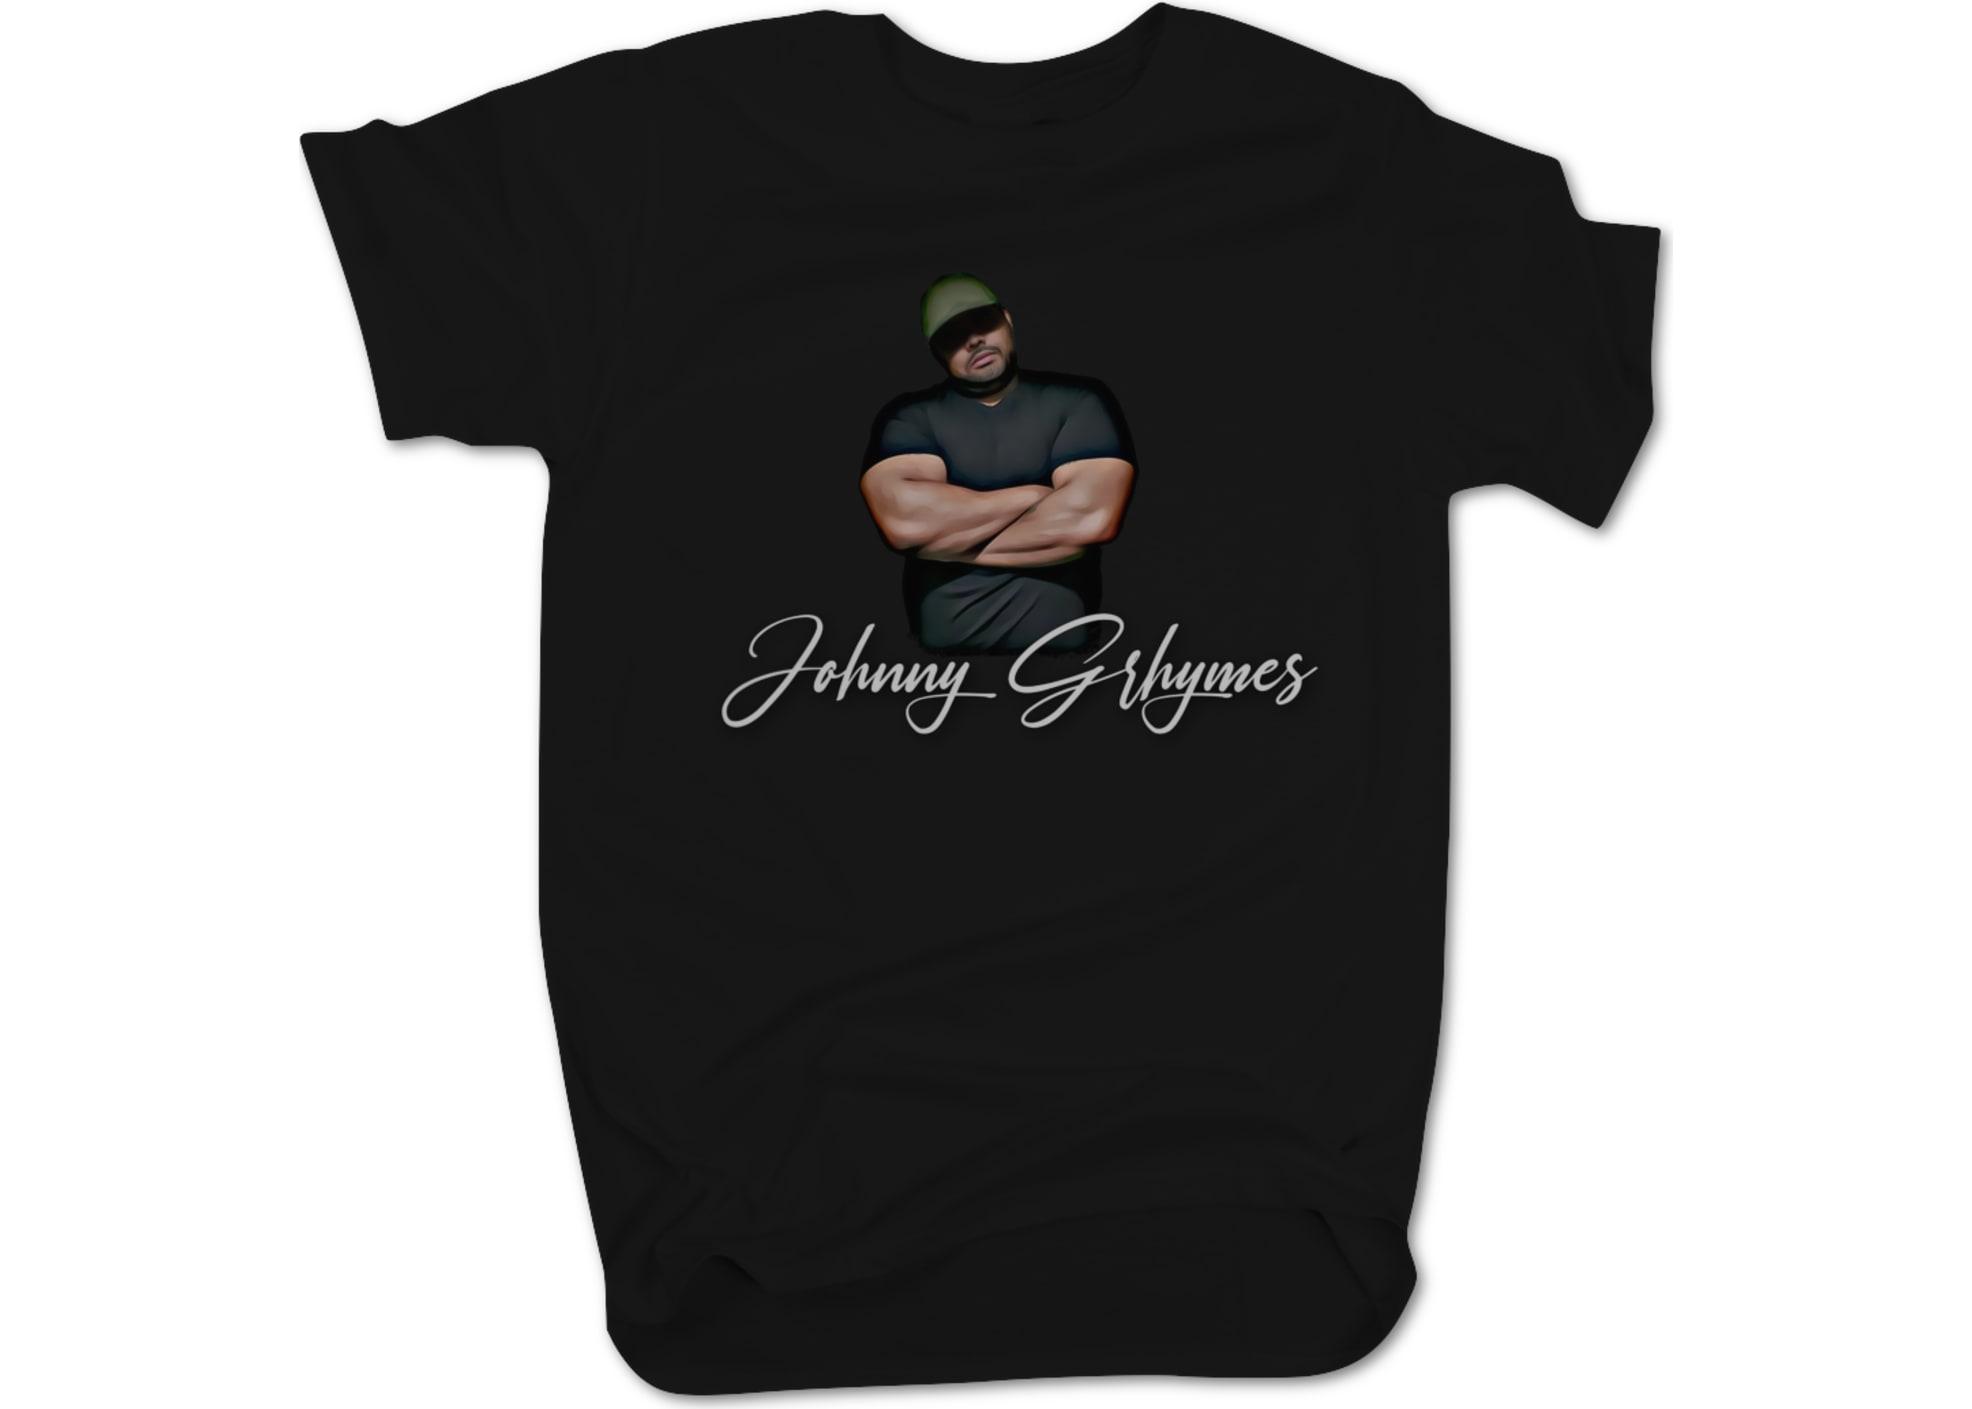 Johnny grhymes crossed logo 1598465314